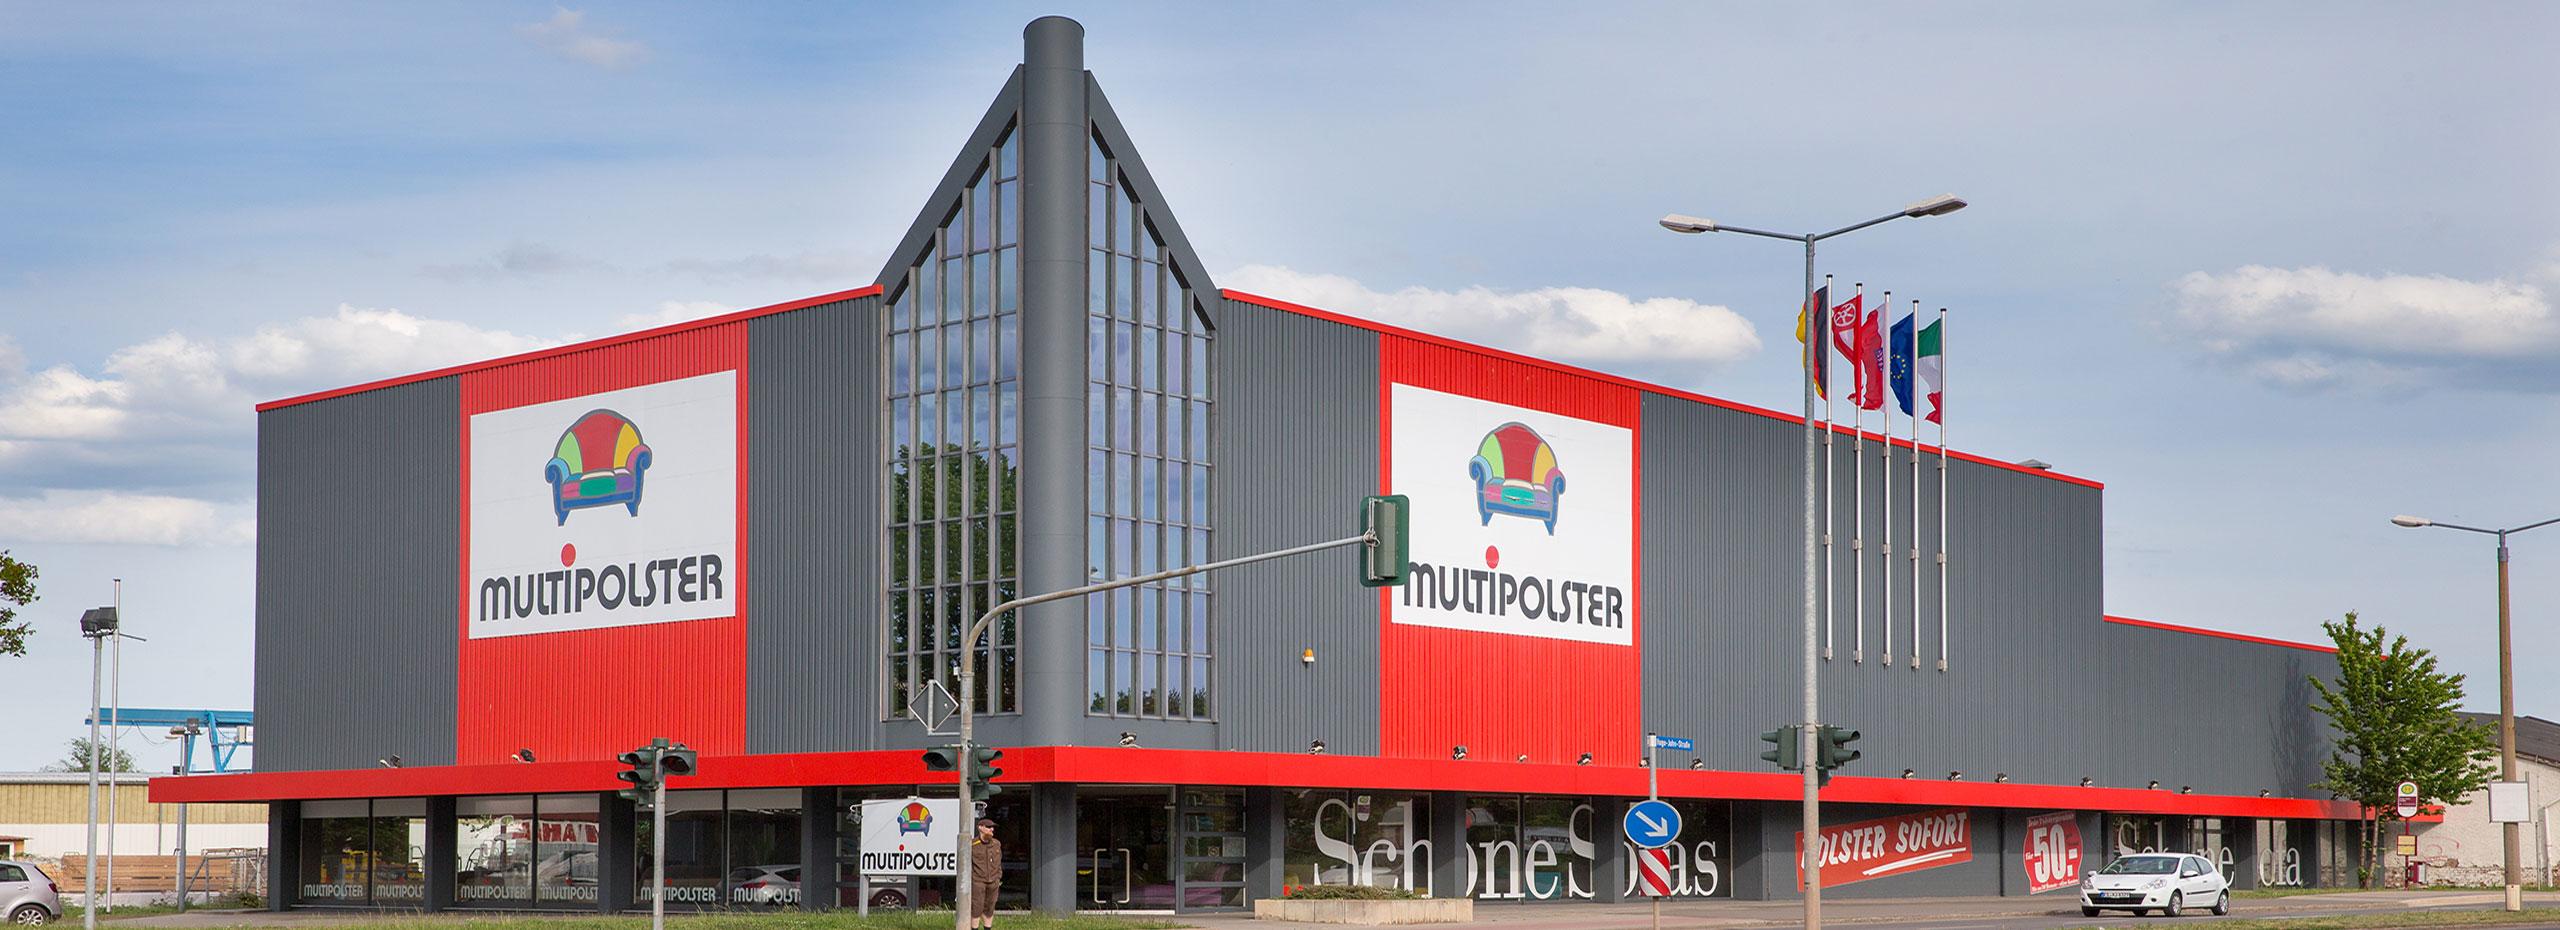 Multipolster - Erfurt